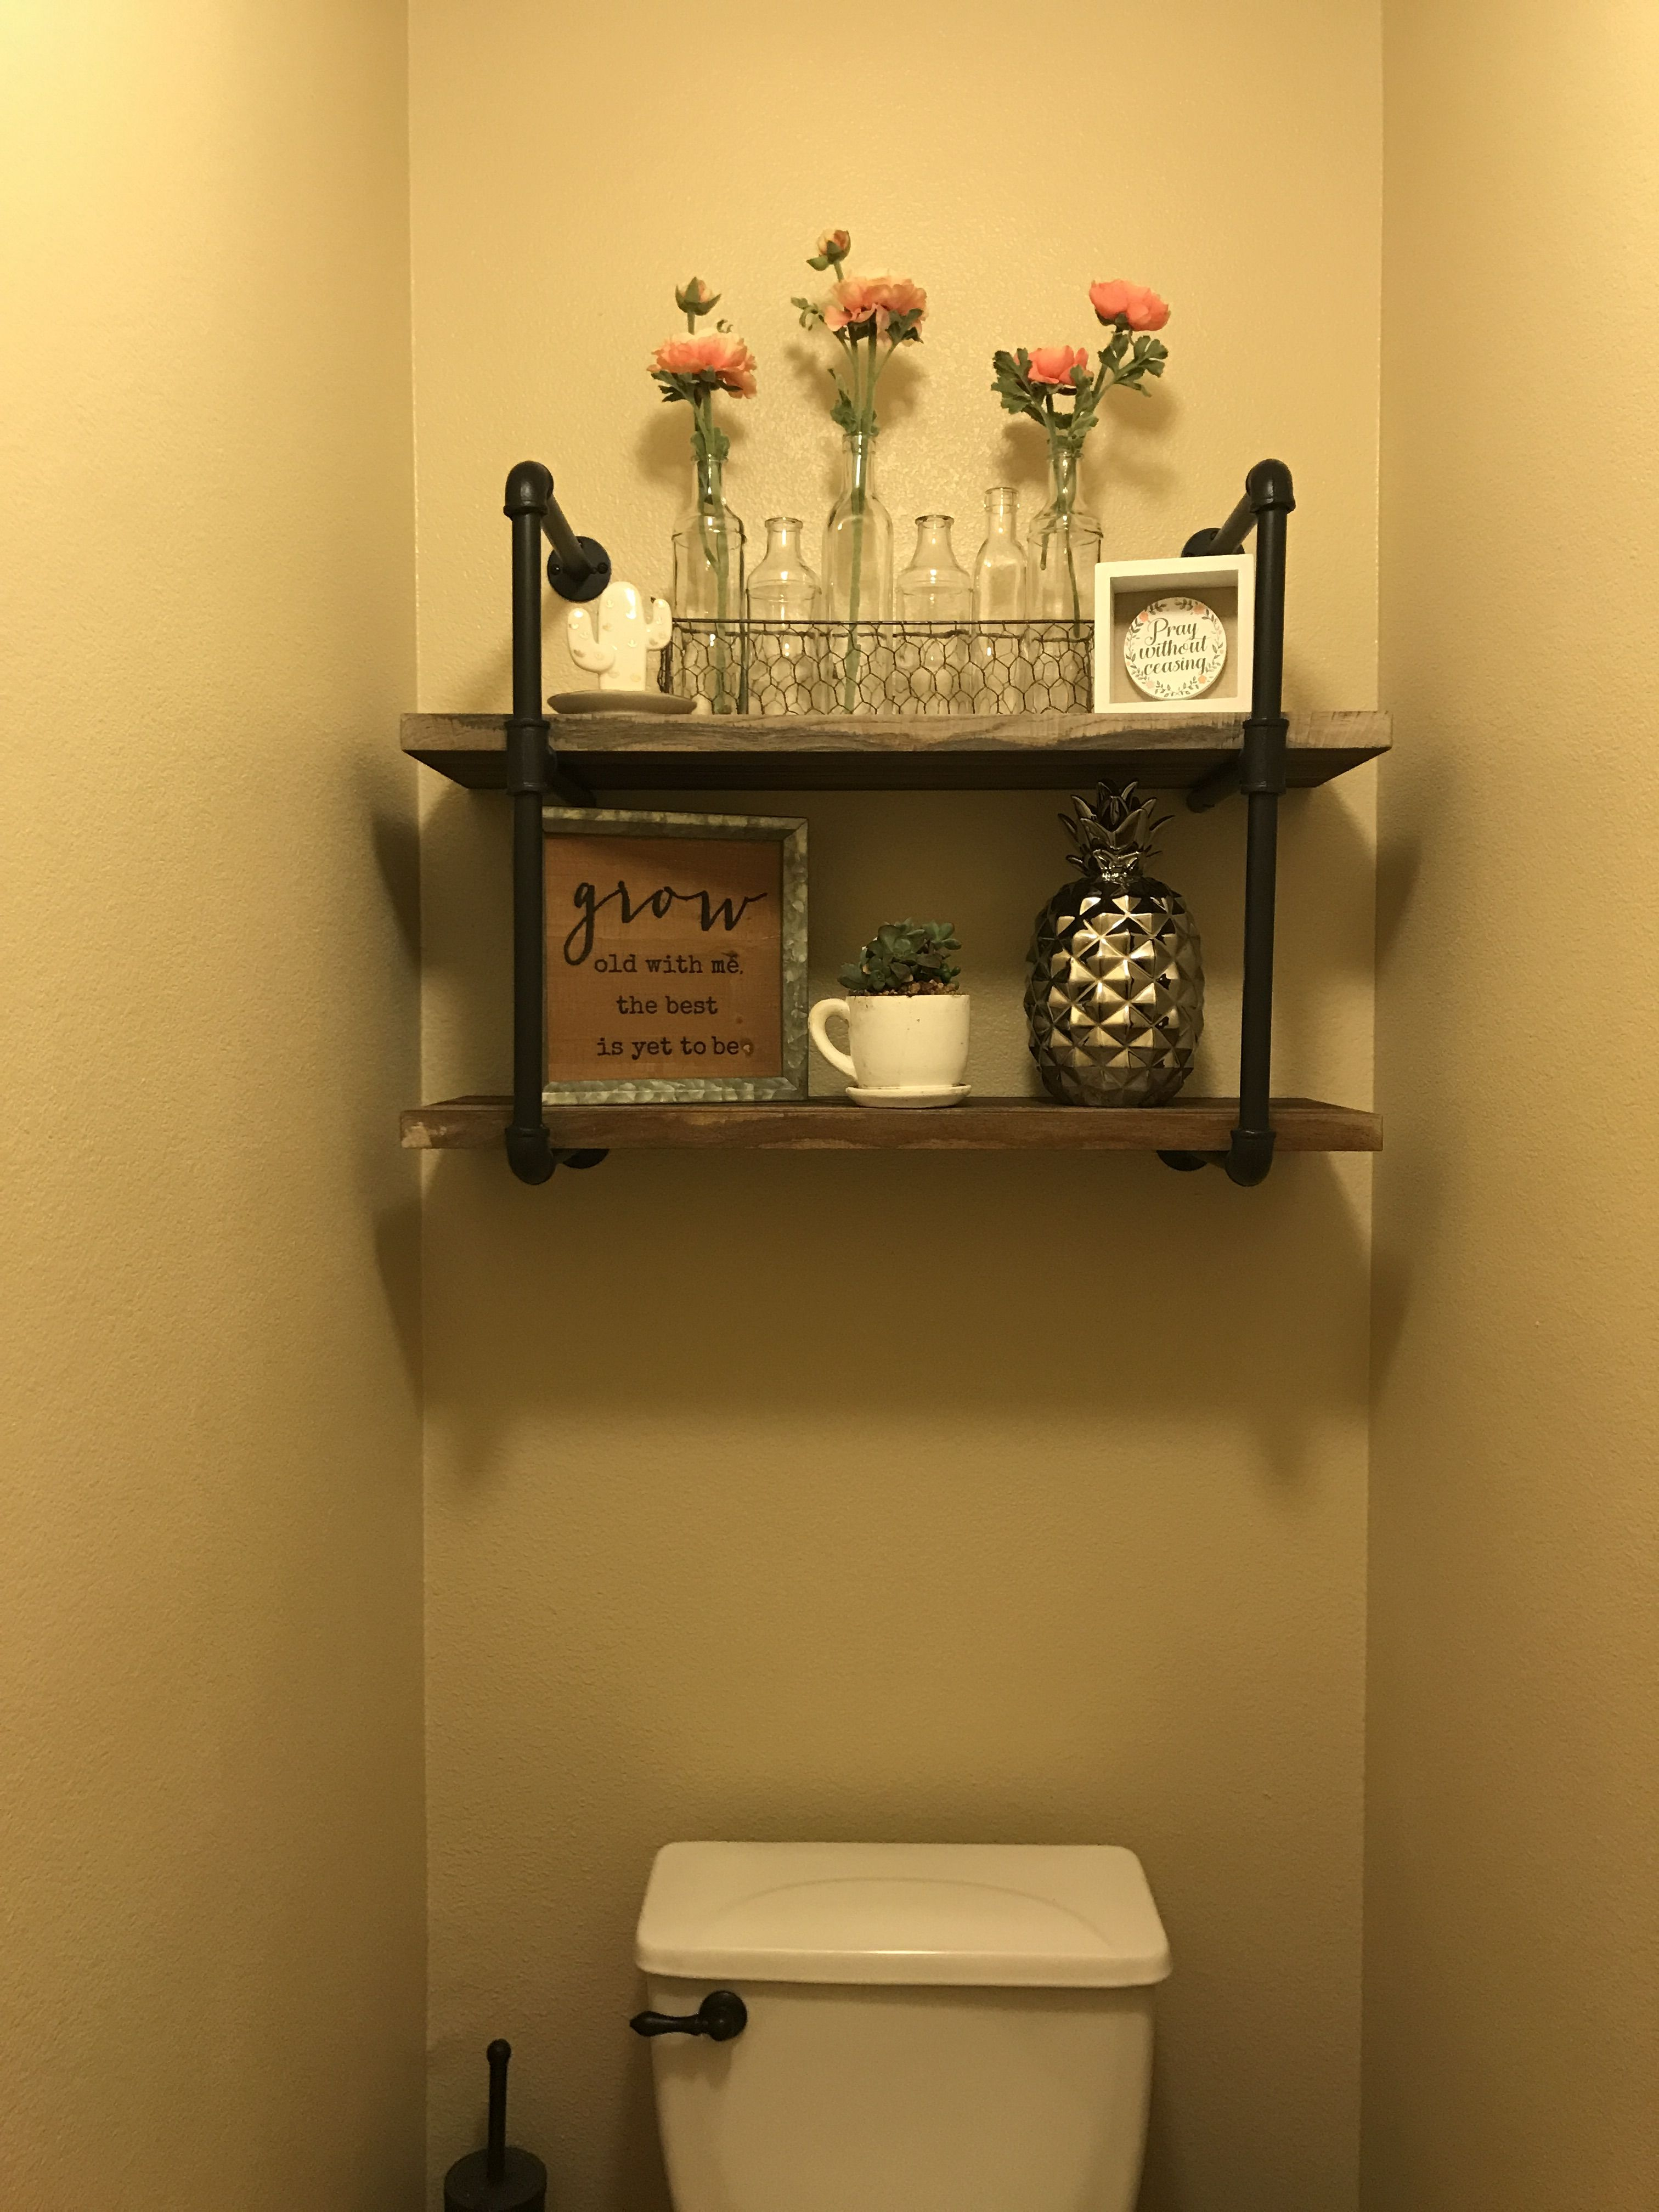 Industrial Looking Bathroom Shelf In My Master Bath Bathroom Shelves Shelves Shelf Design